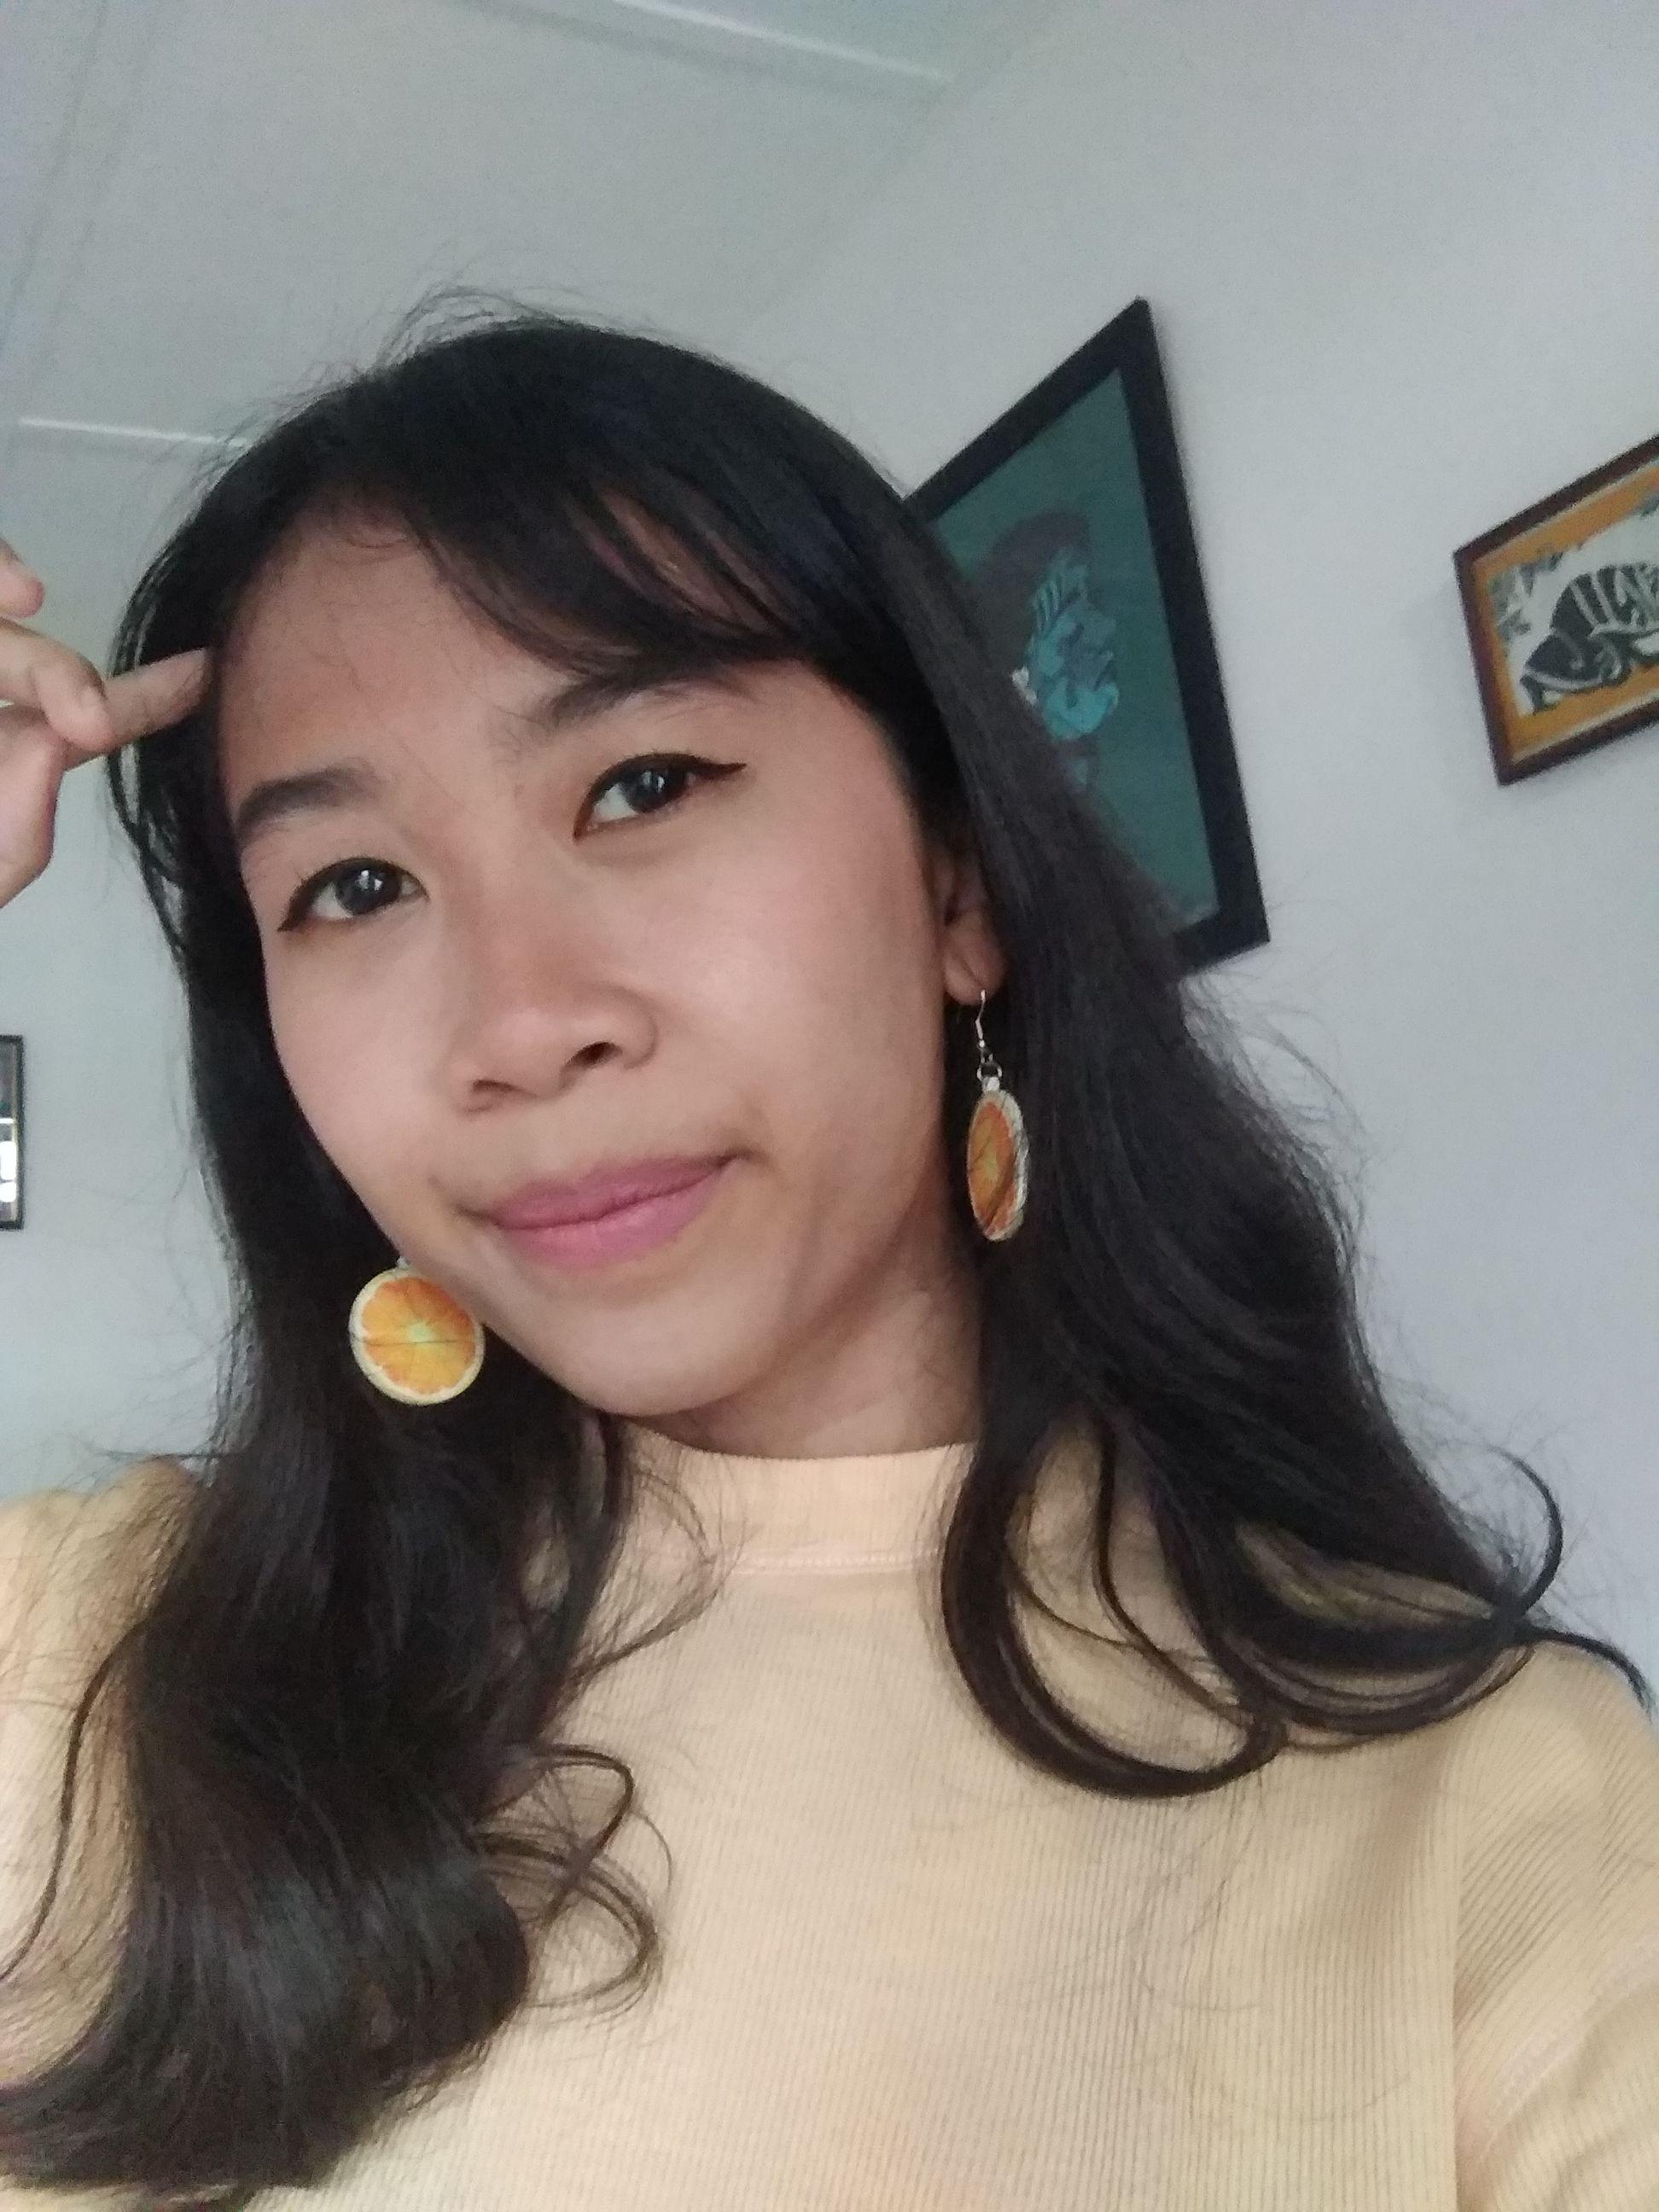 Shikada Facial Cleansing Wipes Cocok Buat Kalian Yang Suka Traveling